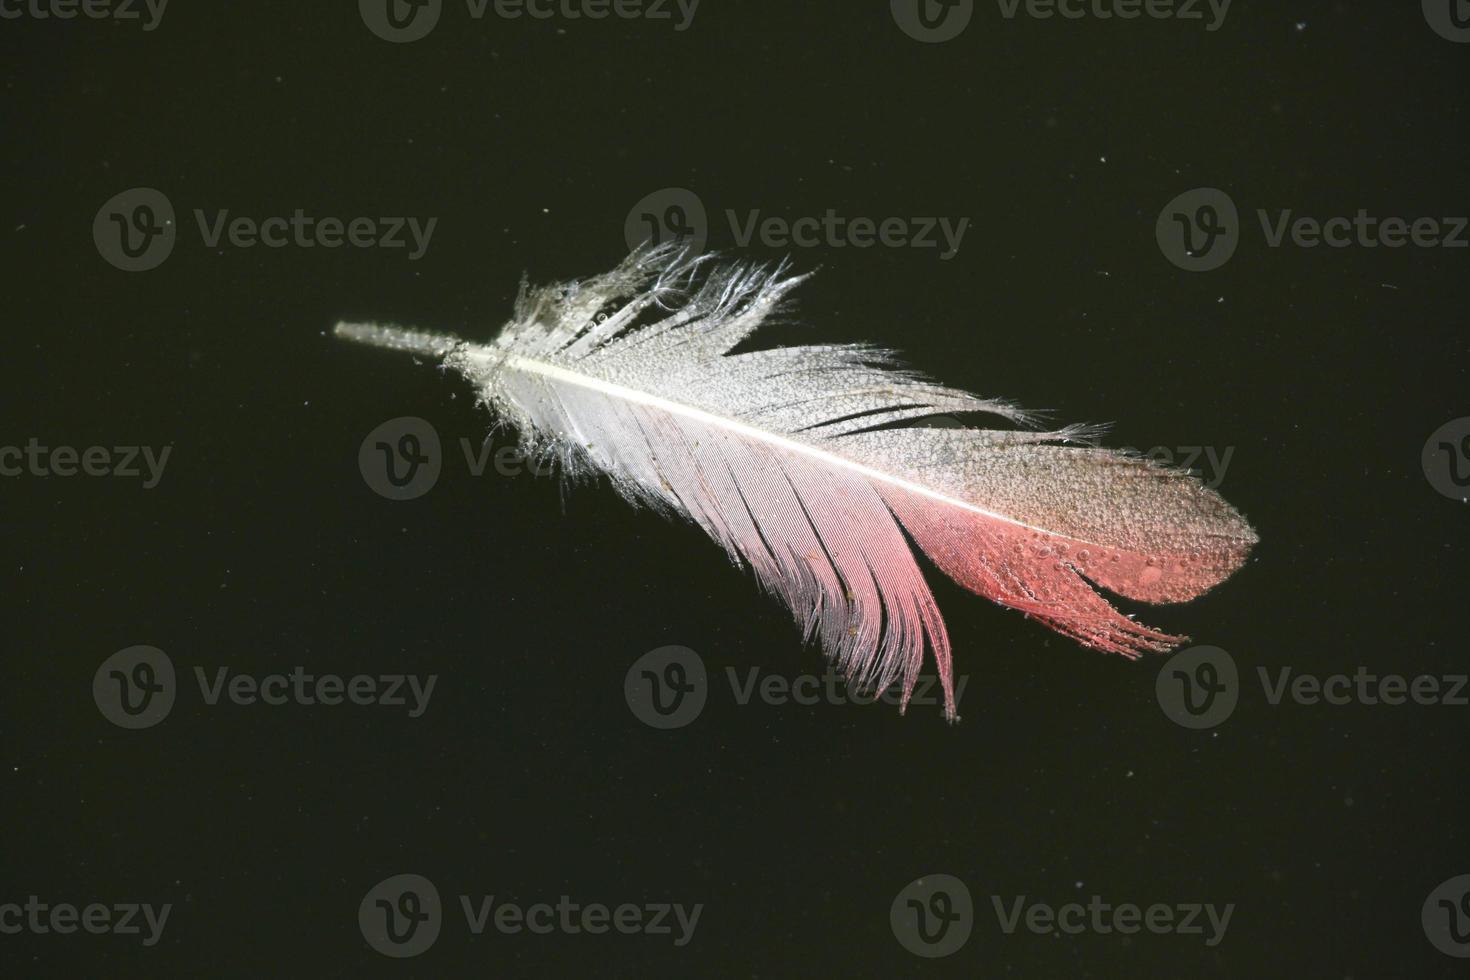 grotere flamingo (phoenicopterus roseus) veer. foto